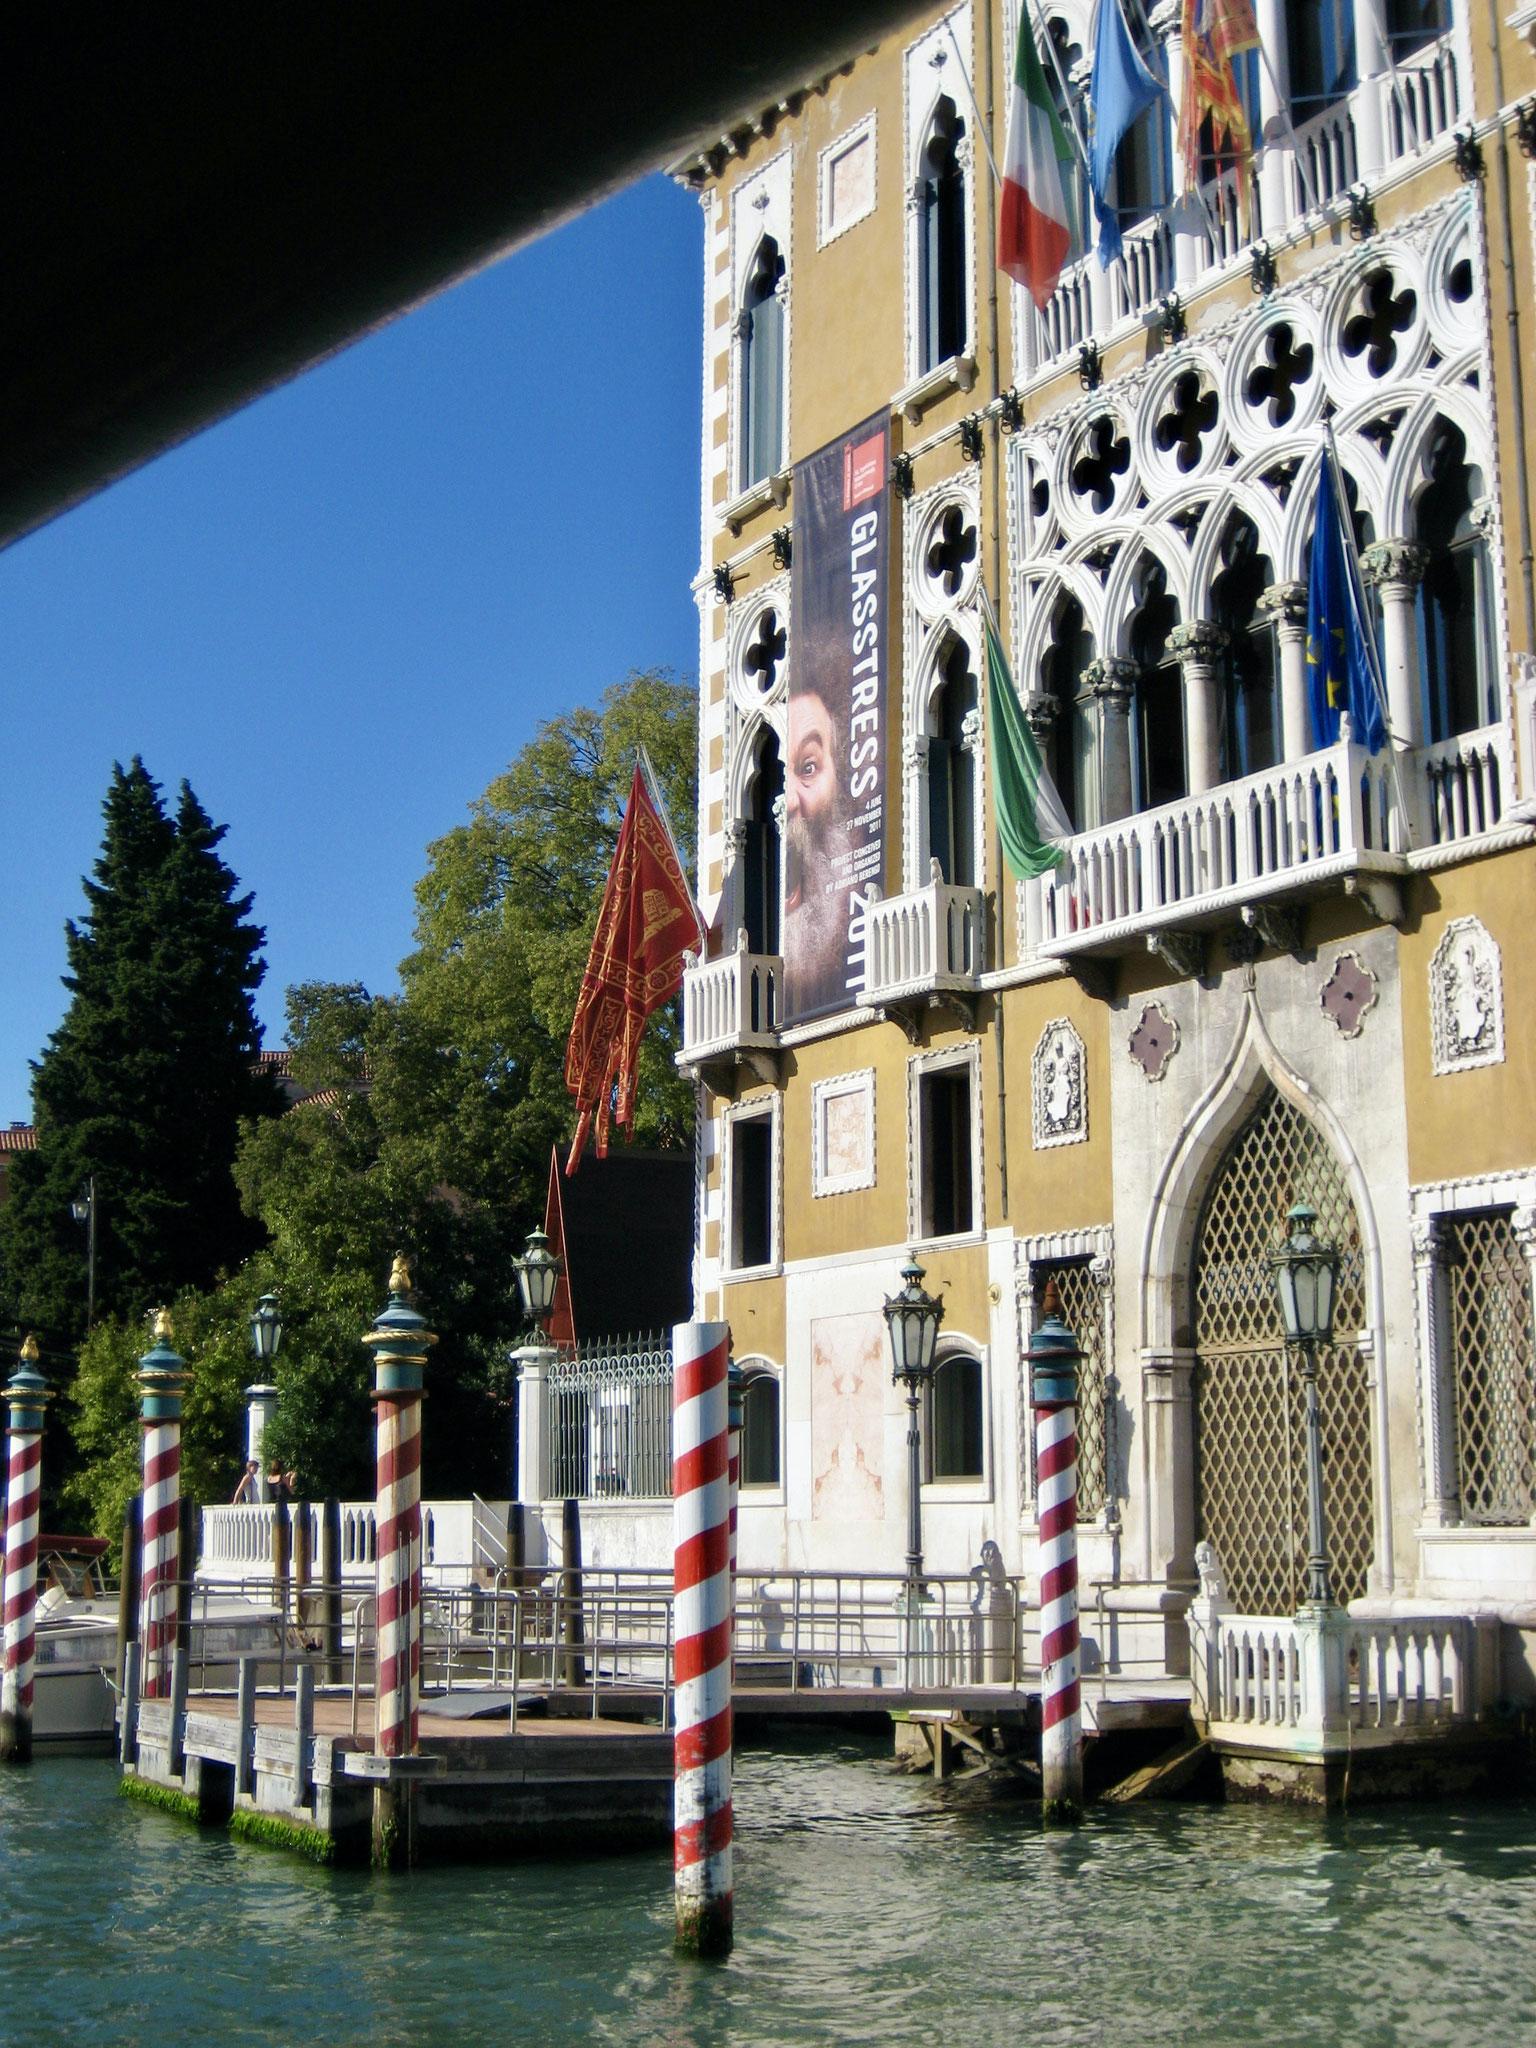 Venice canal 3